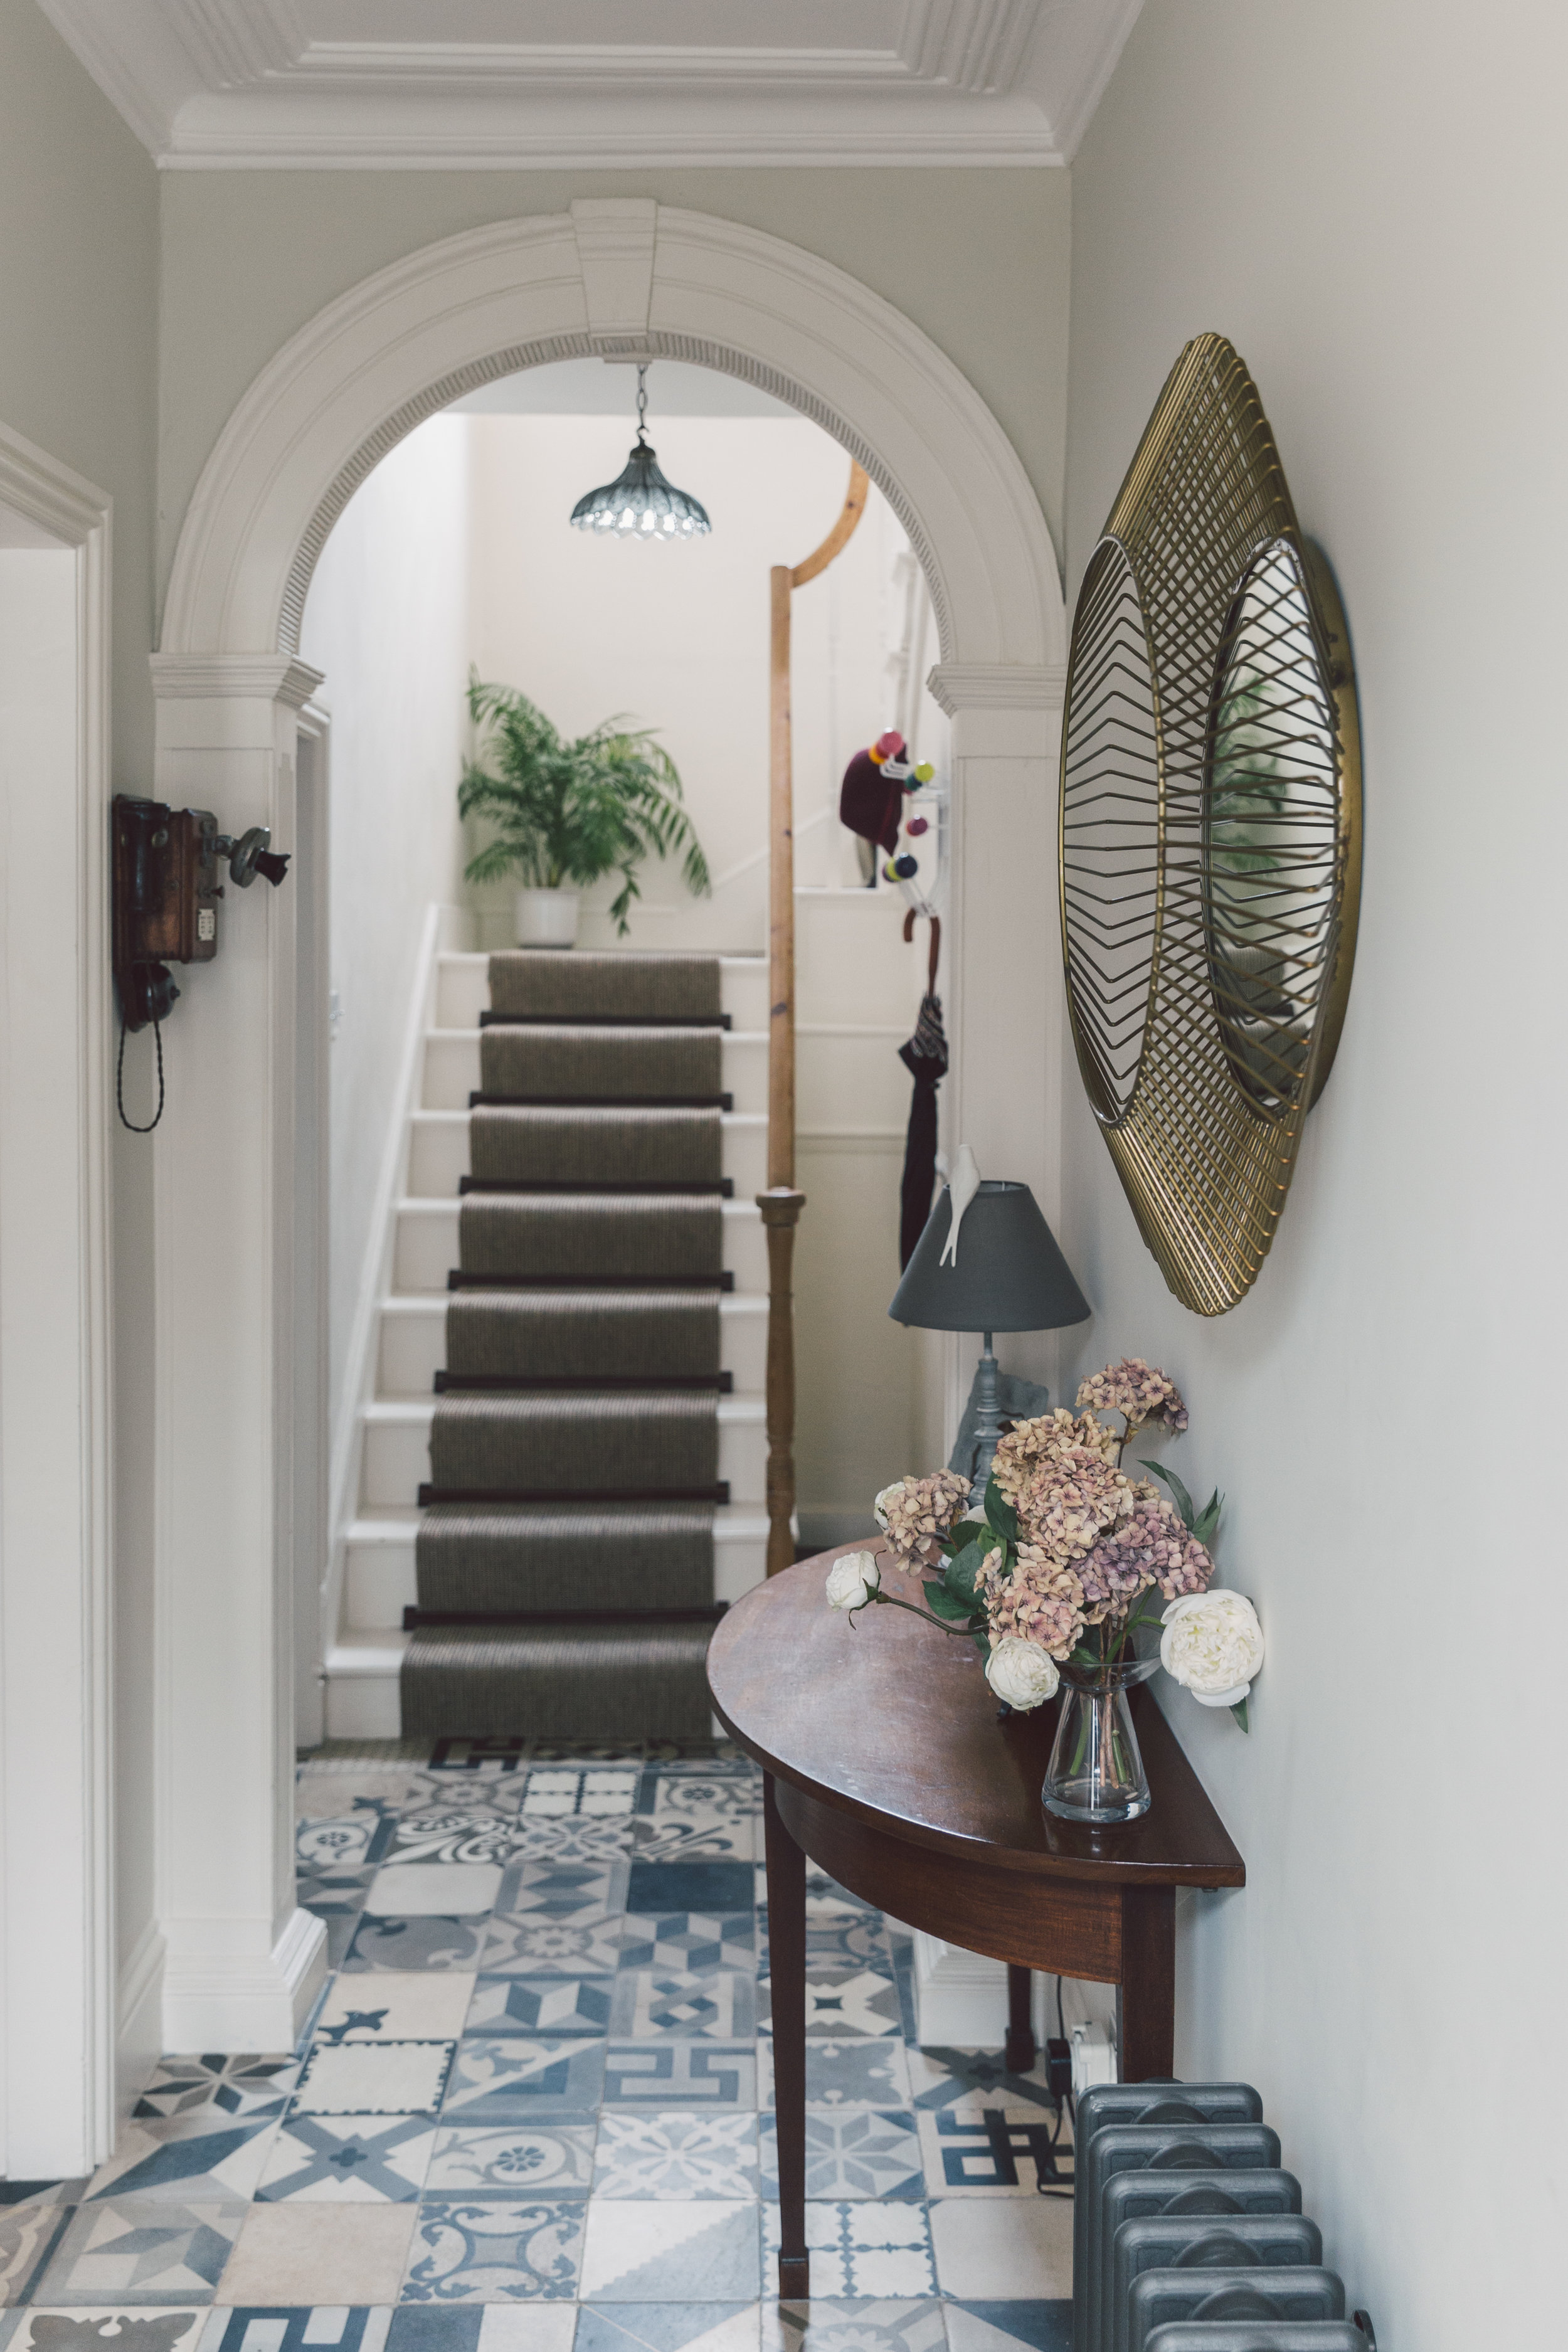 Bert & May tiled hallway